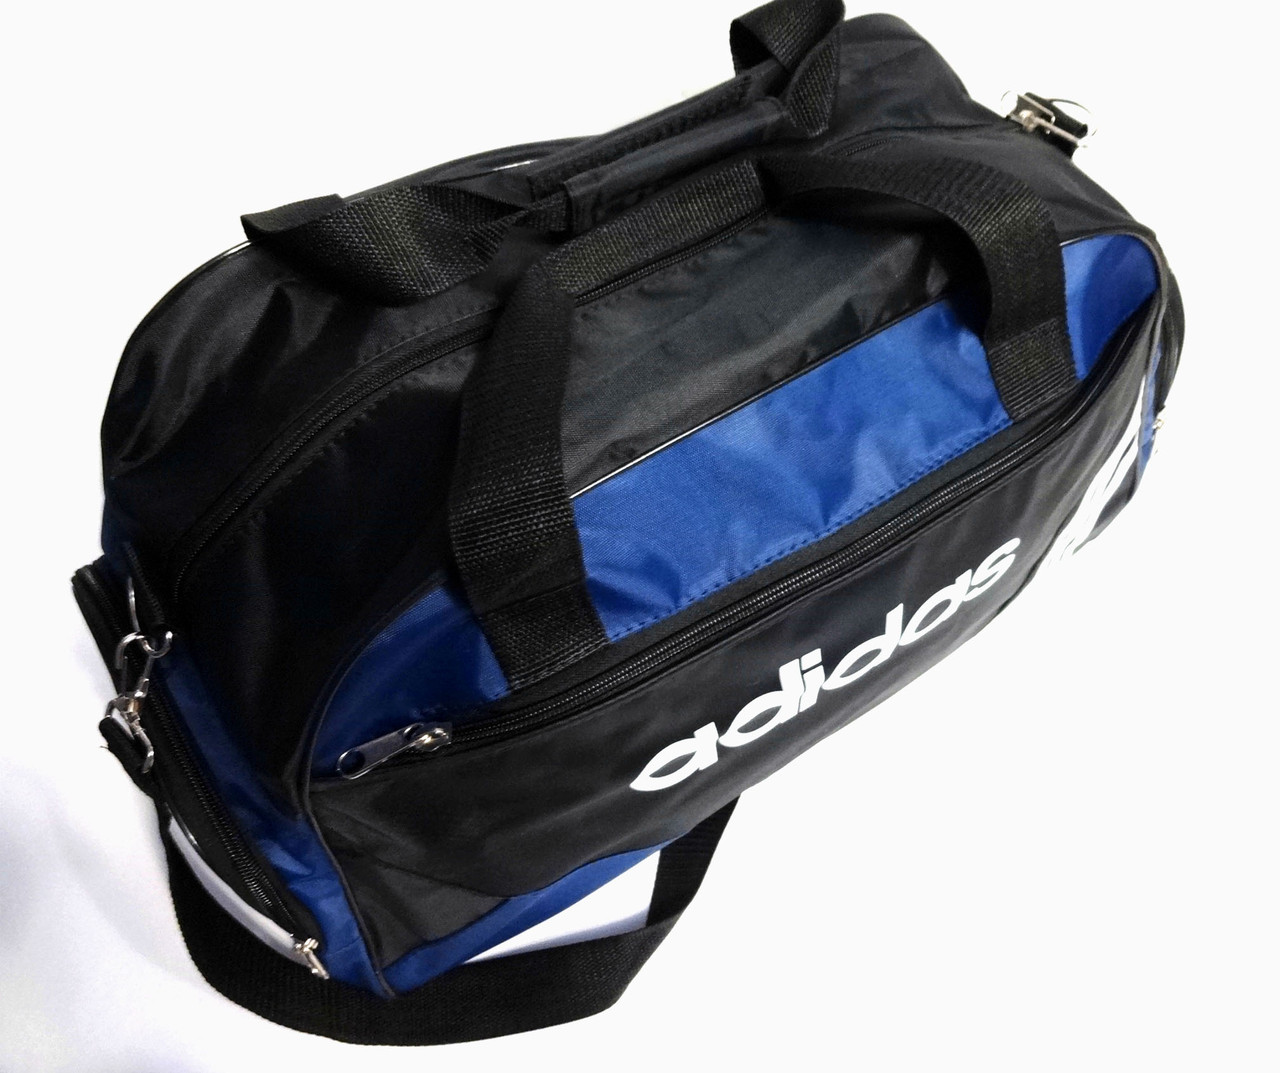 677b0c8198e5 Спортивная сумка Adidas (Адидас) черная с темно синим. 4 отделения реплика  ...